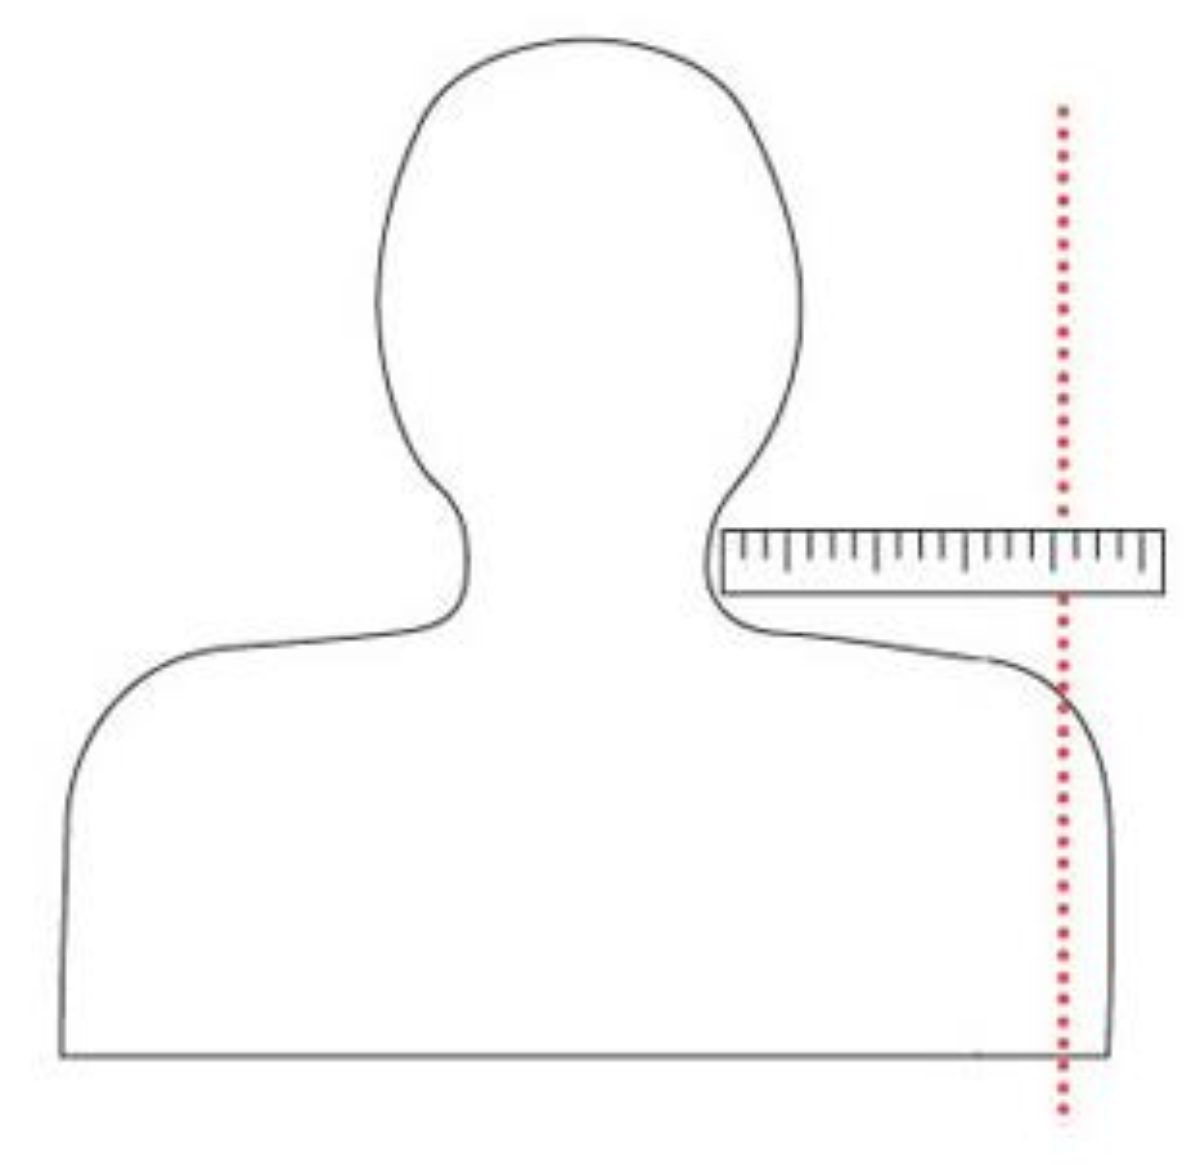 right tempurpedic neck pillow size